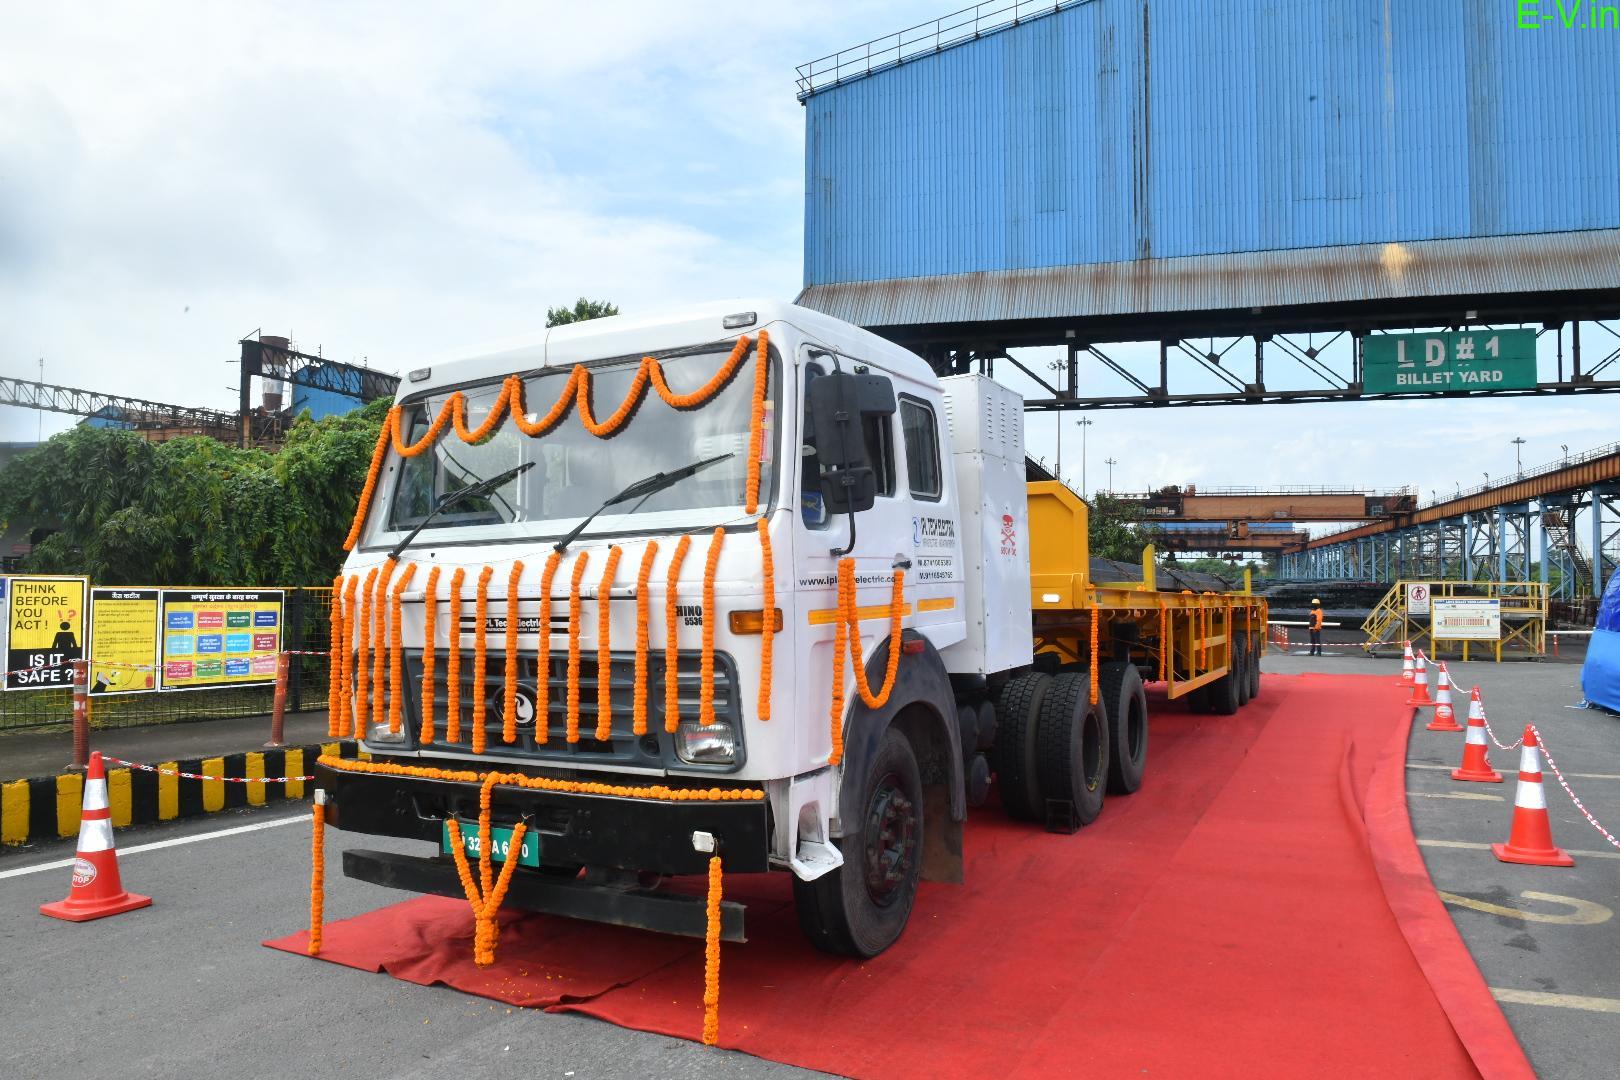 Tata Steel uses electric vehicles